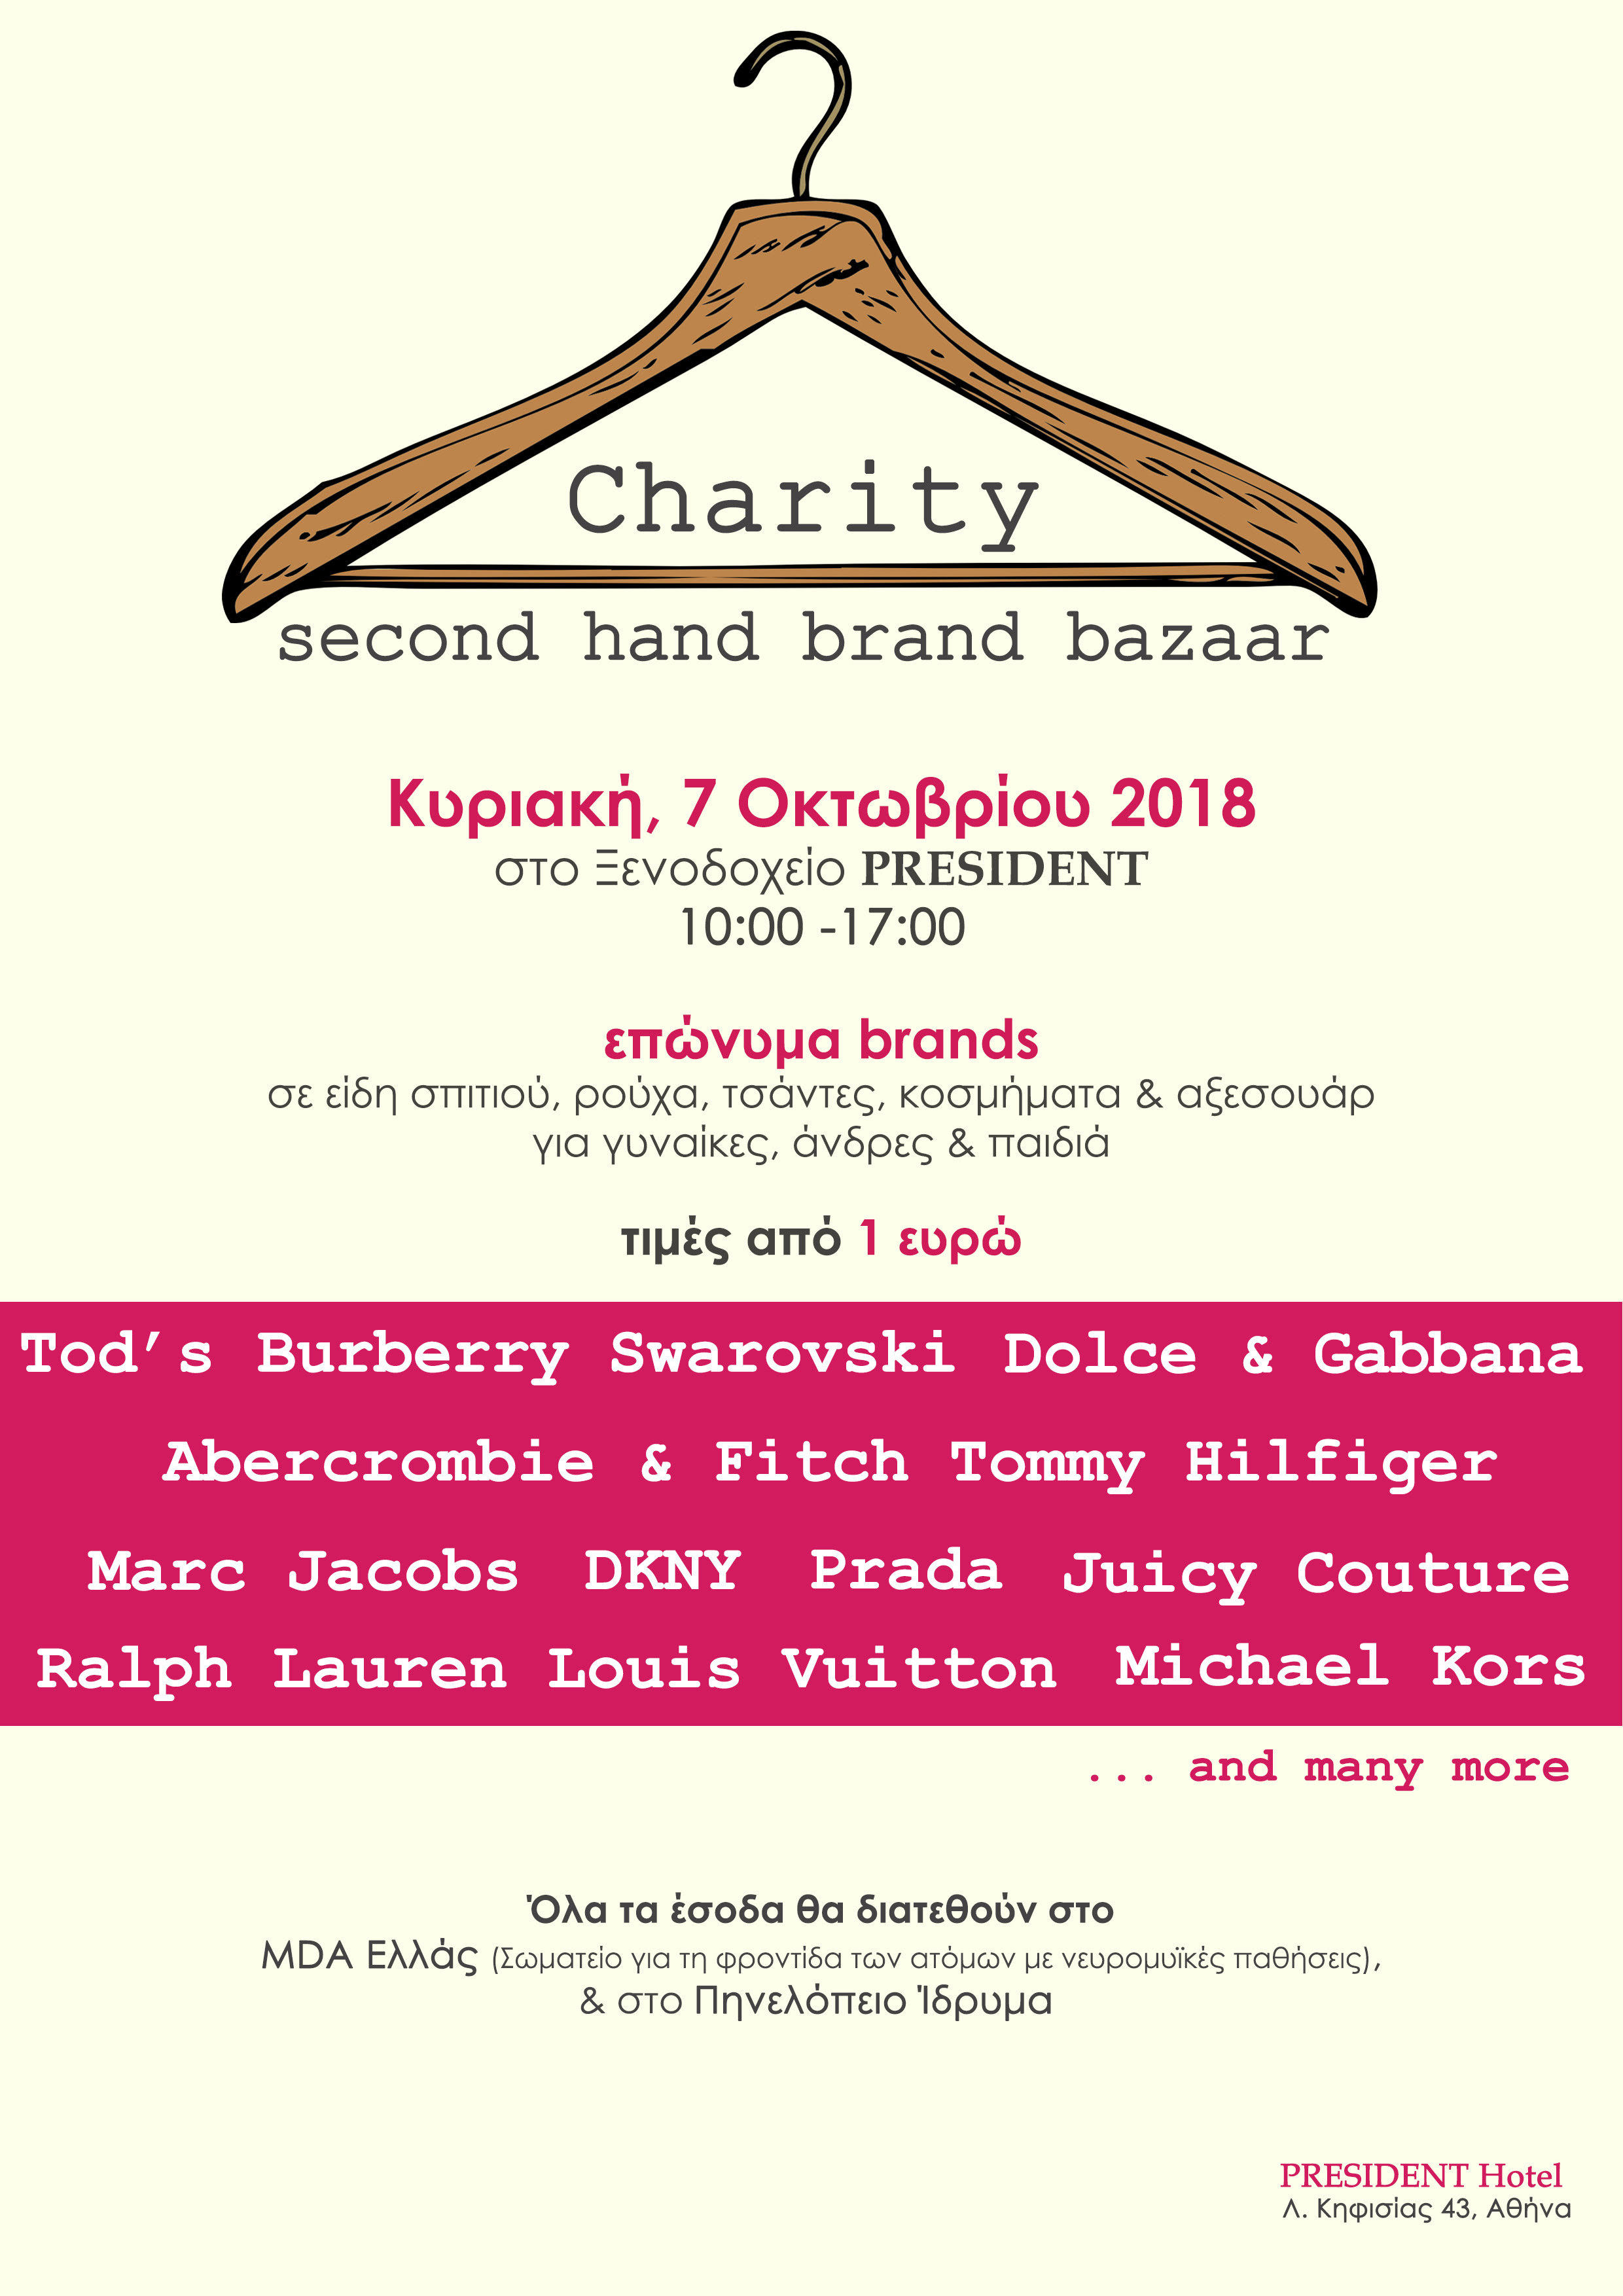 546faa47e8 MDA ΕΛΛΑΣ - Second Hand Brand Bazaar στις 7 10 2018 - Dynami tis ...